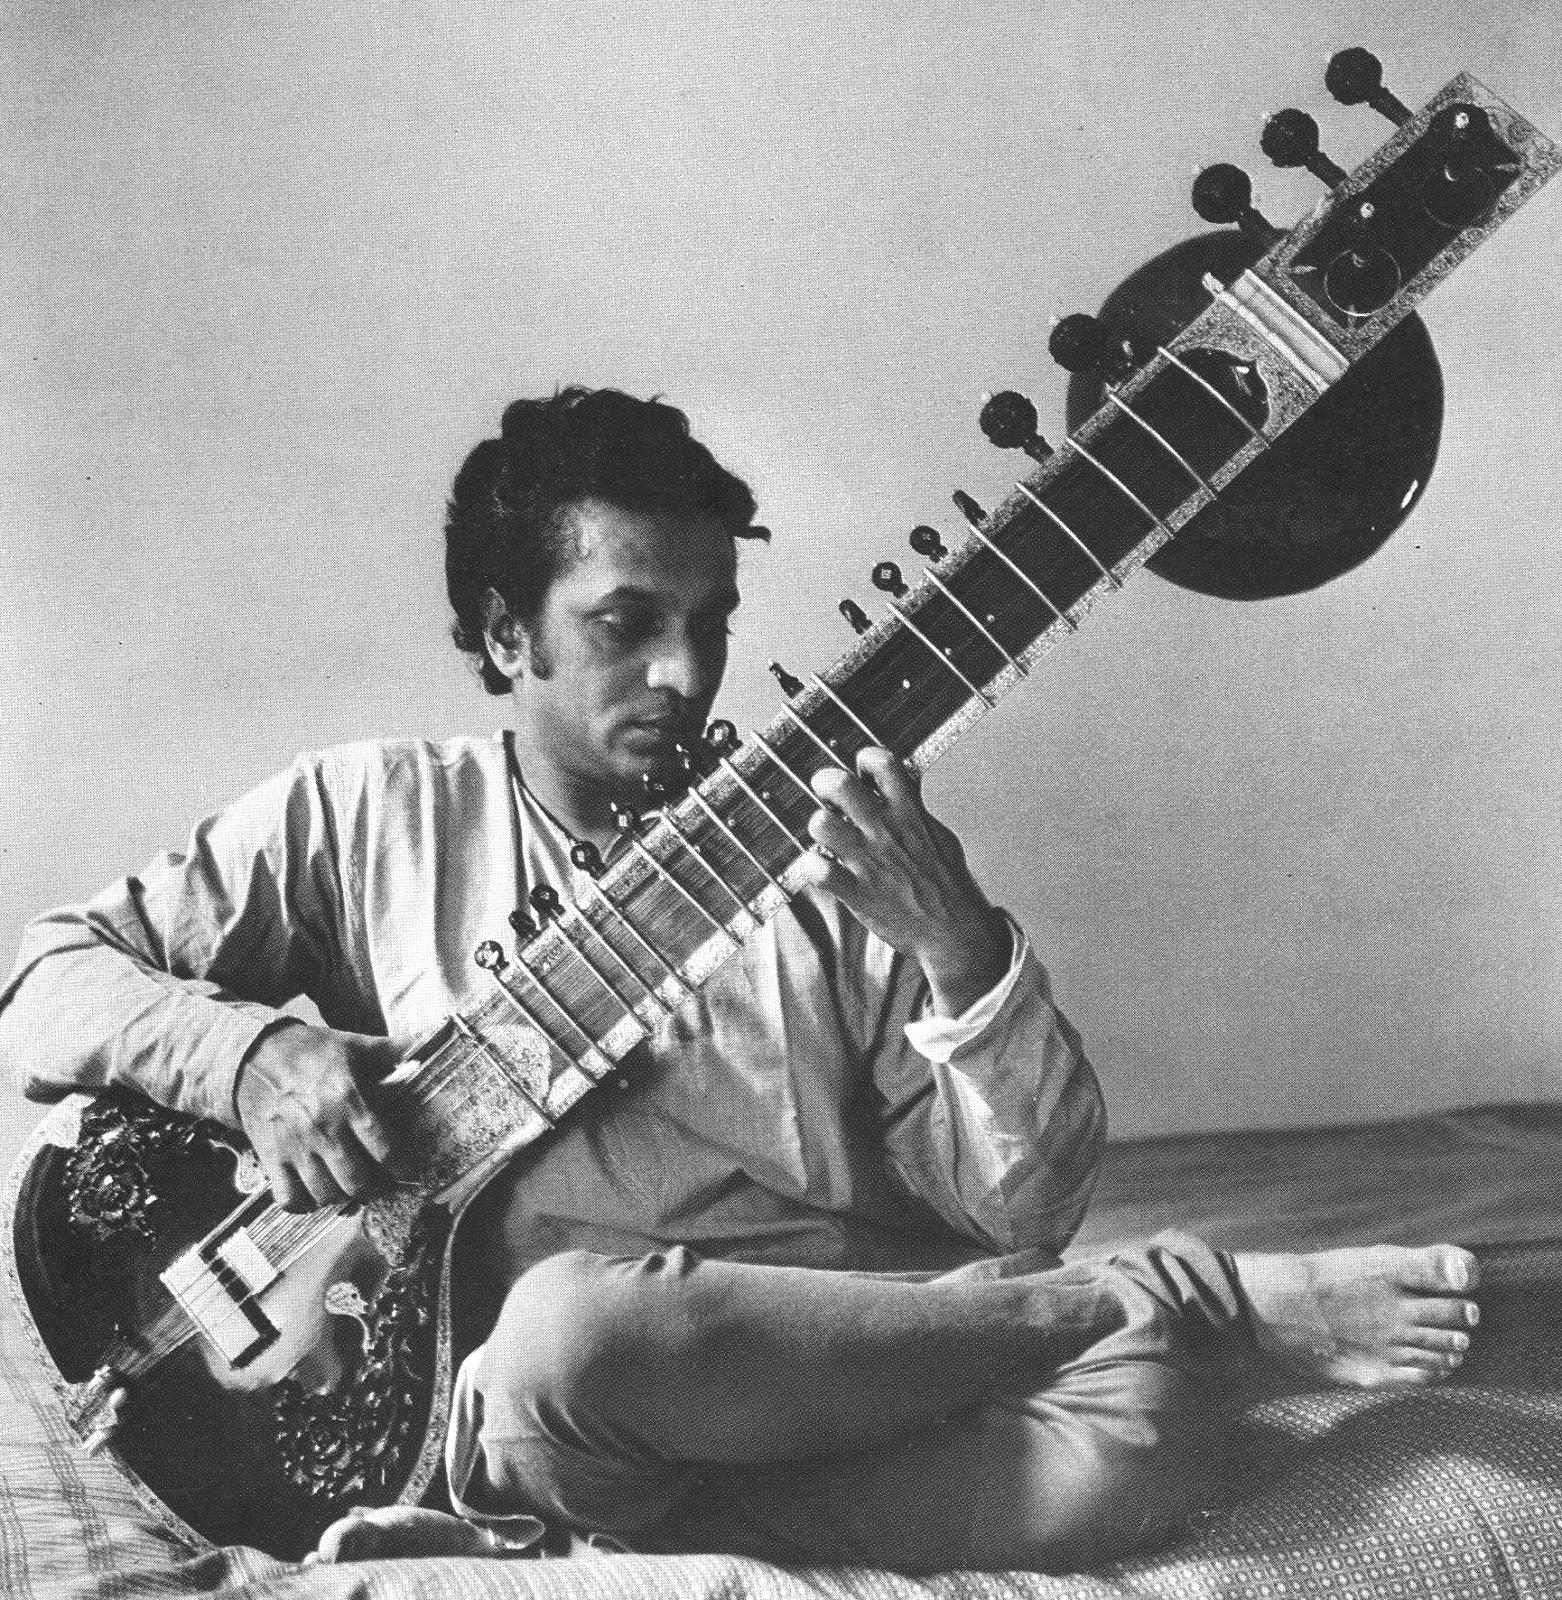 Ananda Shankar Ananda Shankar And His Music Streets Of Calcutta / Dancin' Drums